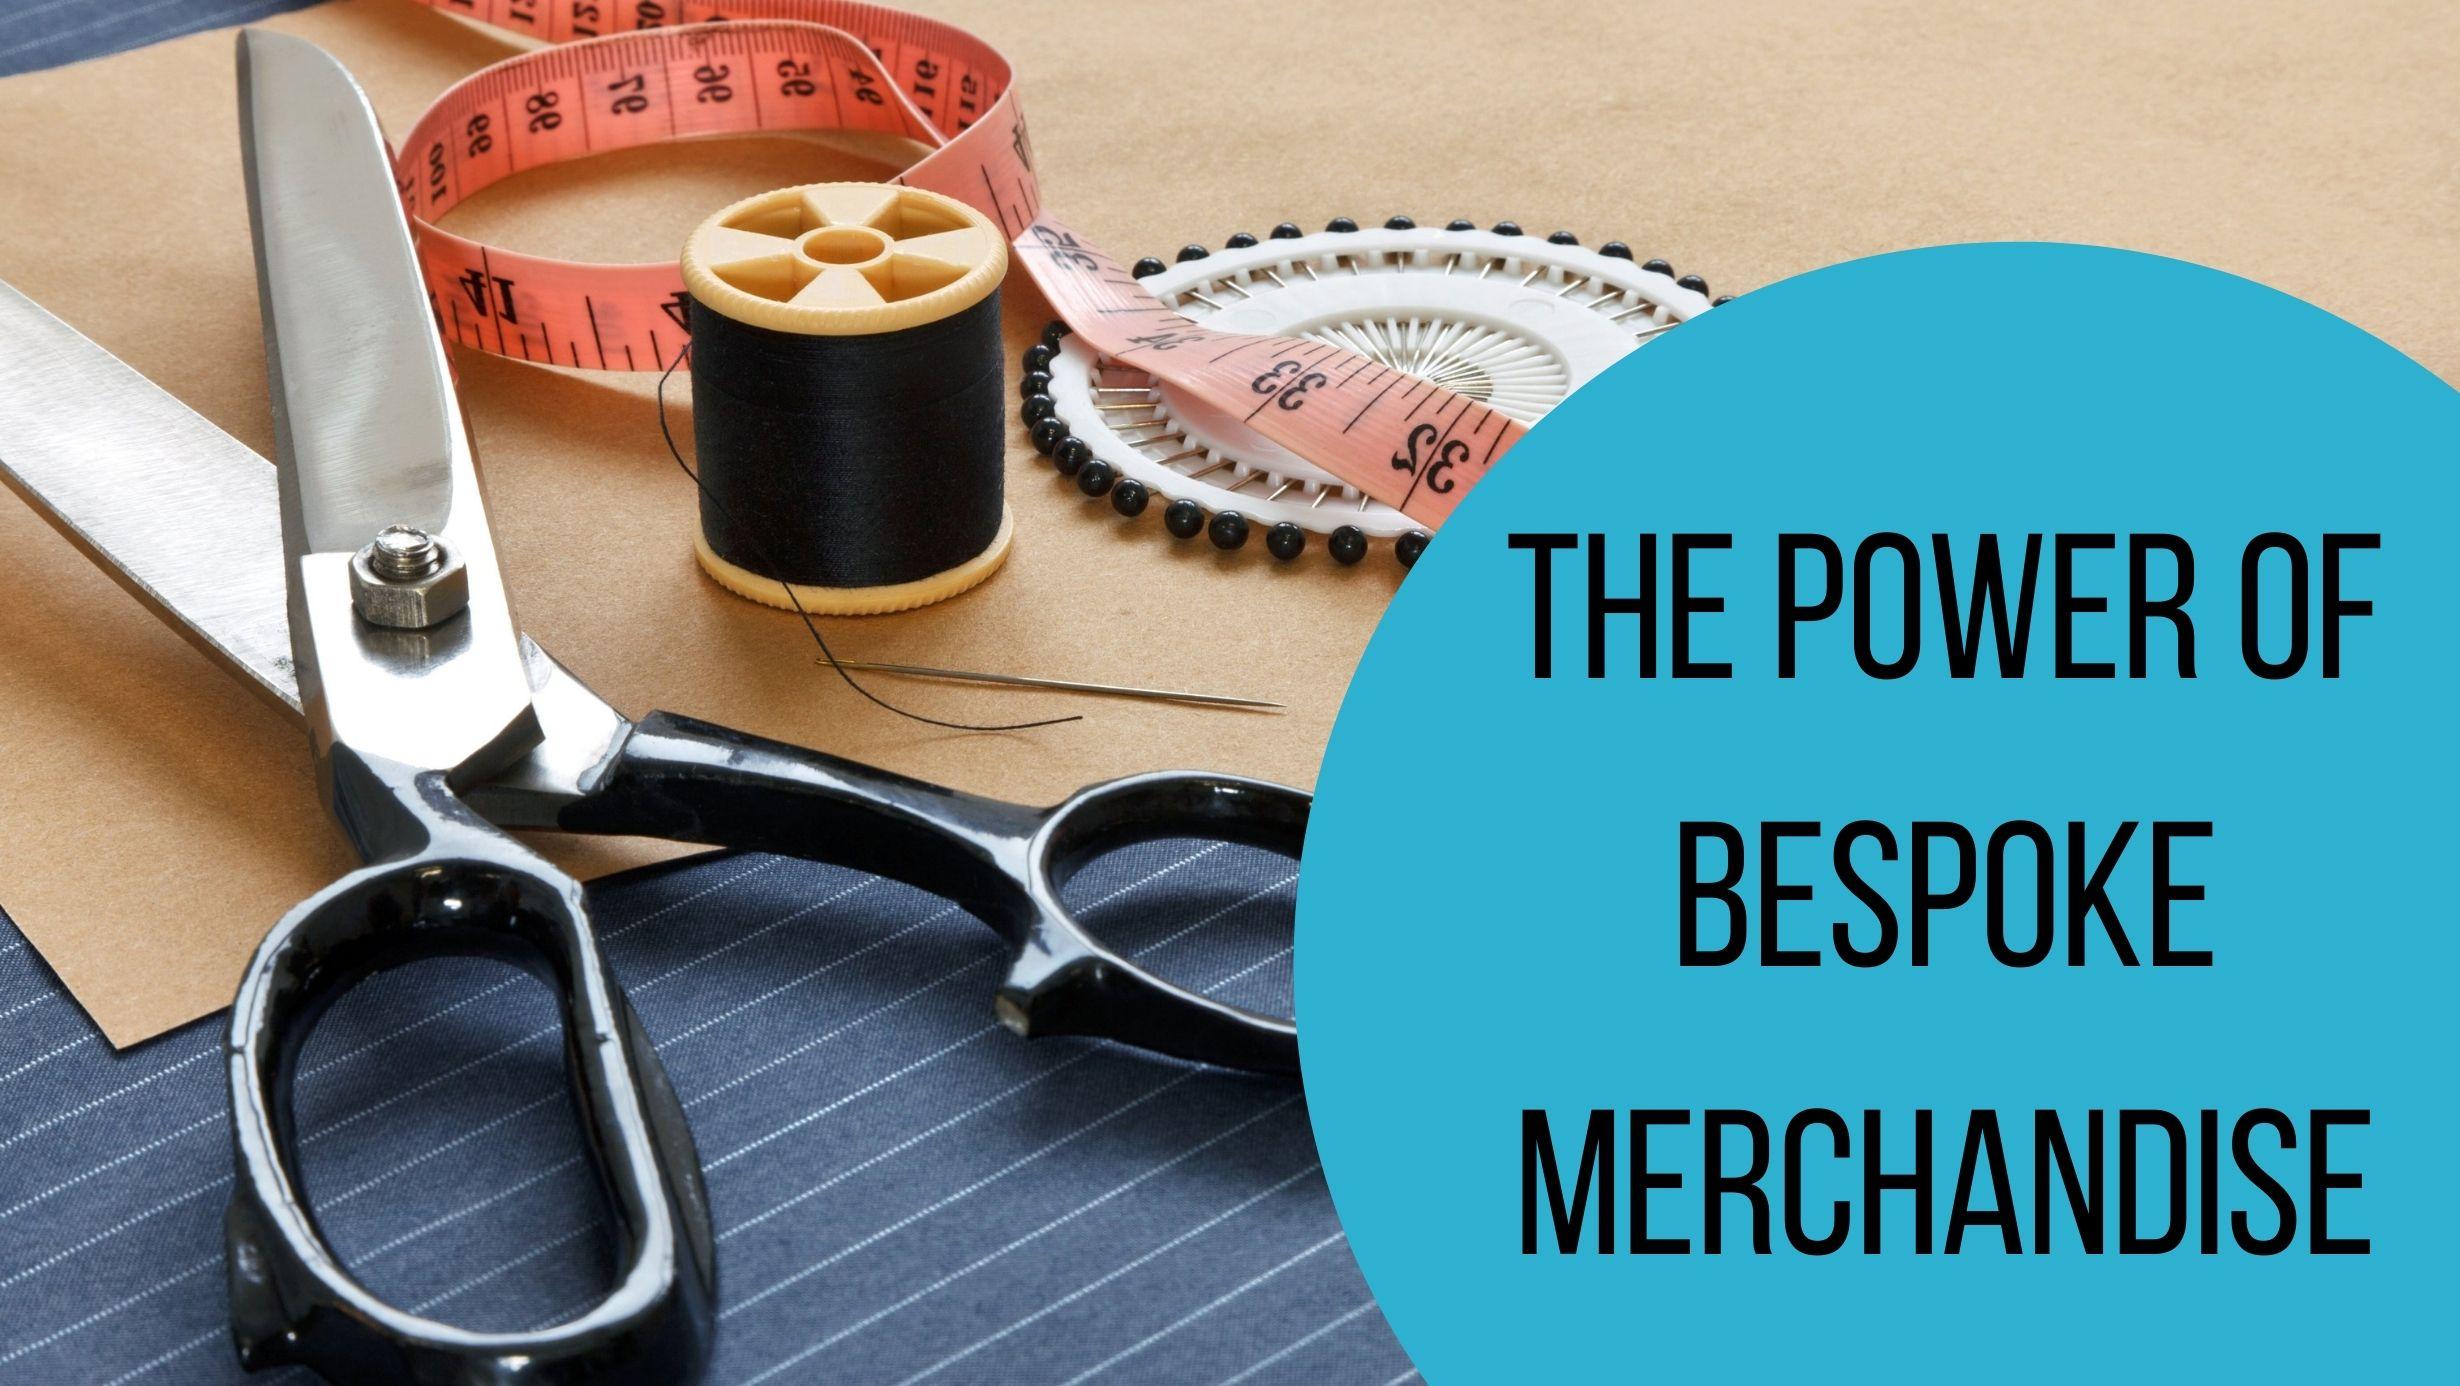 The power of bespoke merchandise header